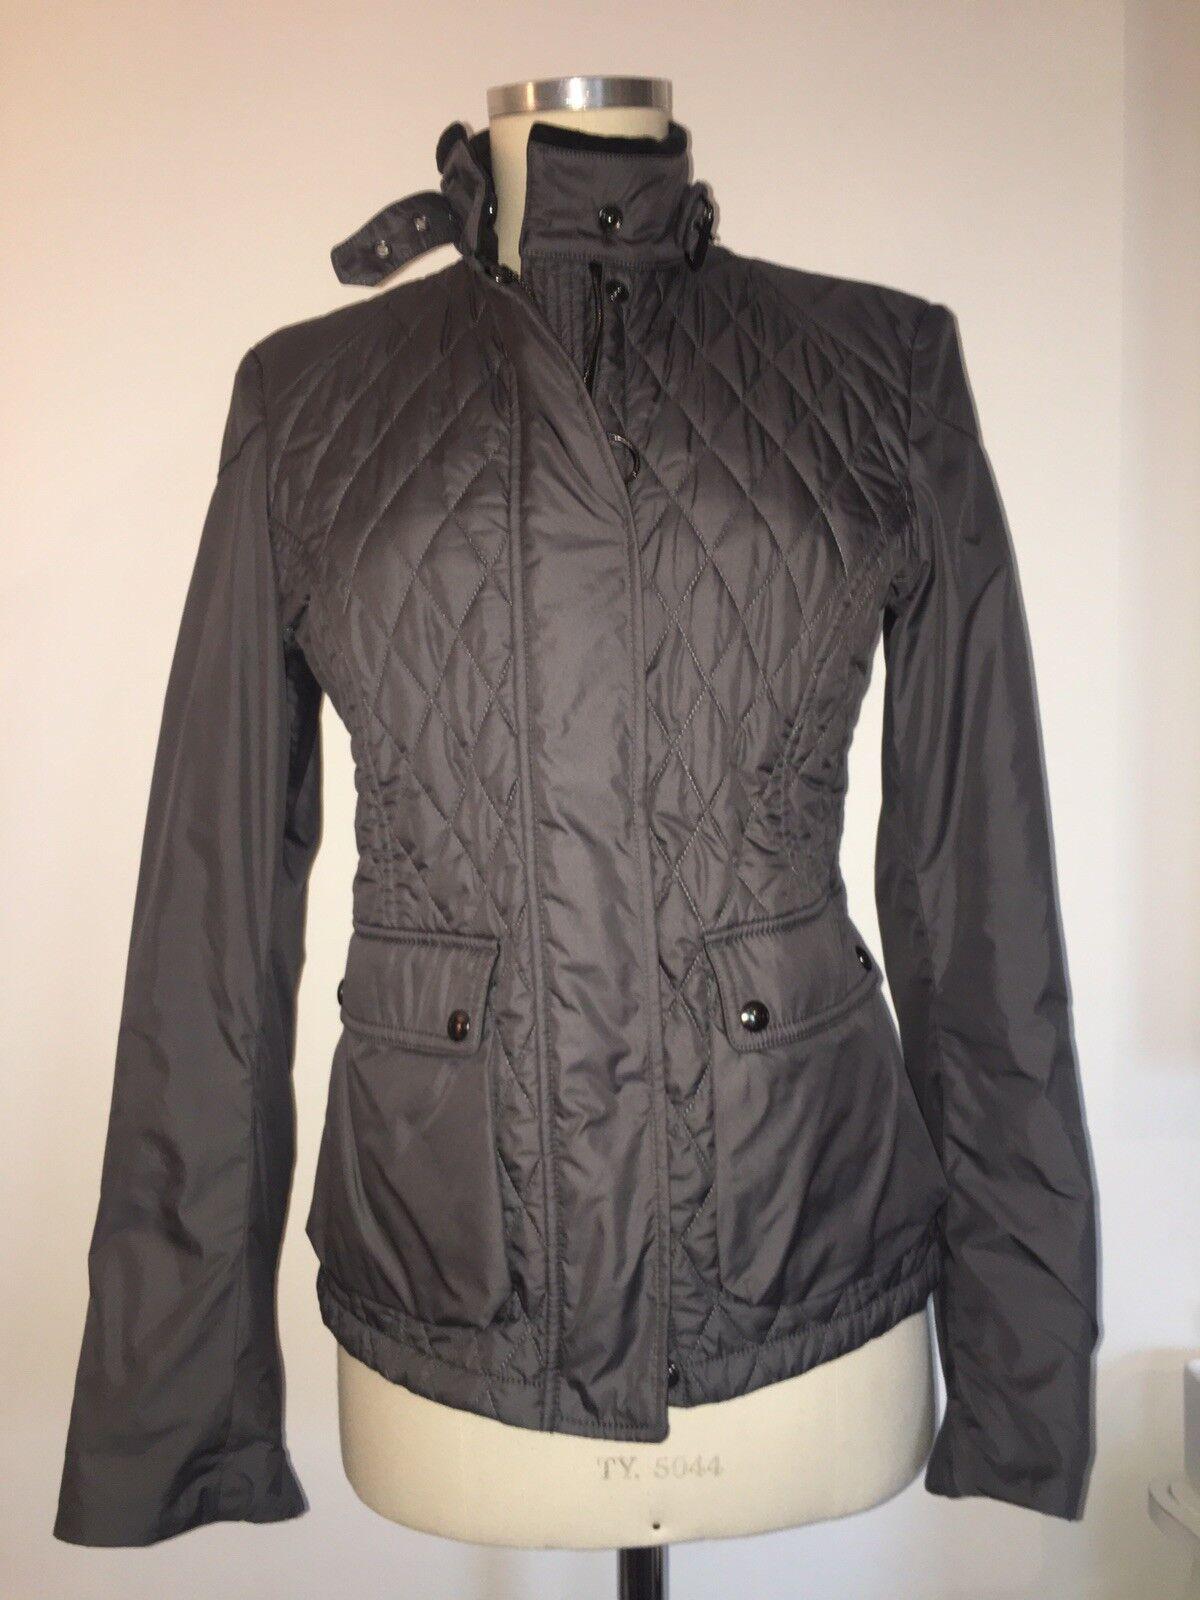 a000dddc1d58b0 Belstaff Biker Jacke Parker 46 38 40) M L Grau Top Original Jacket ...